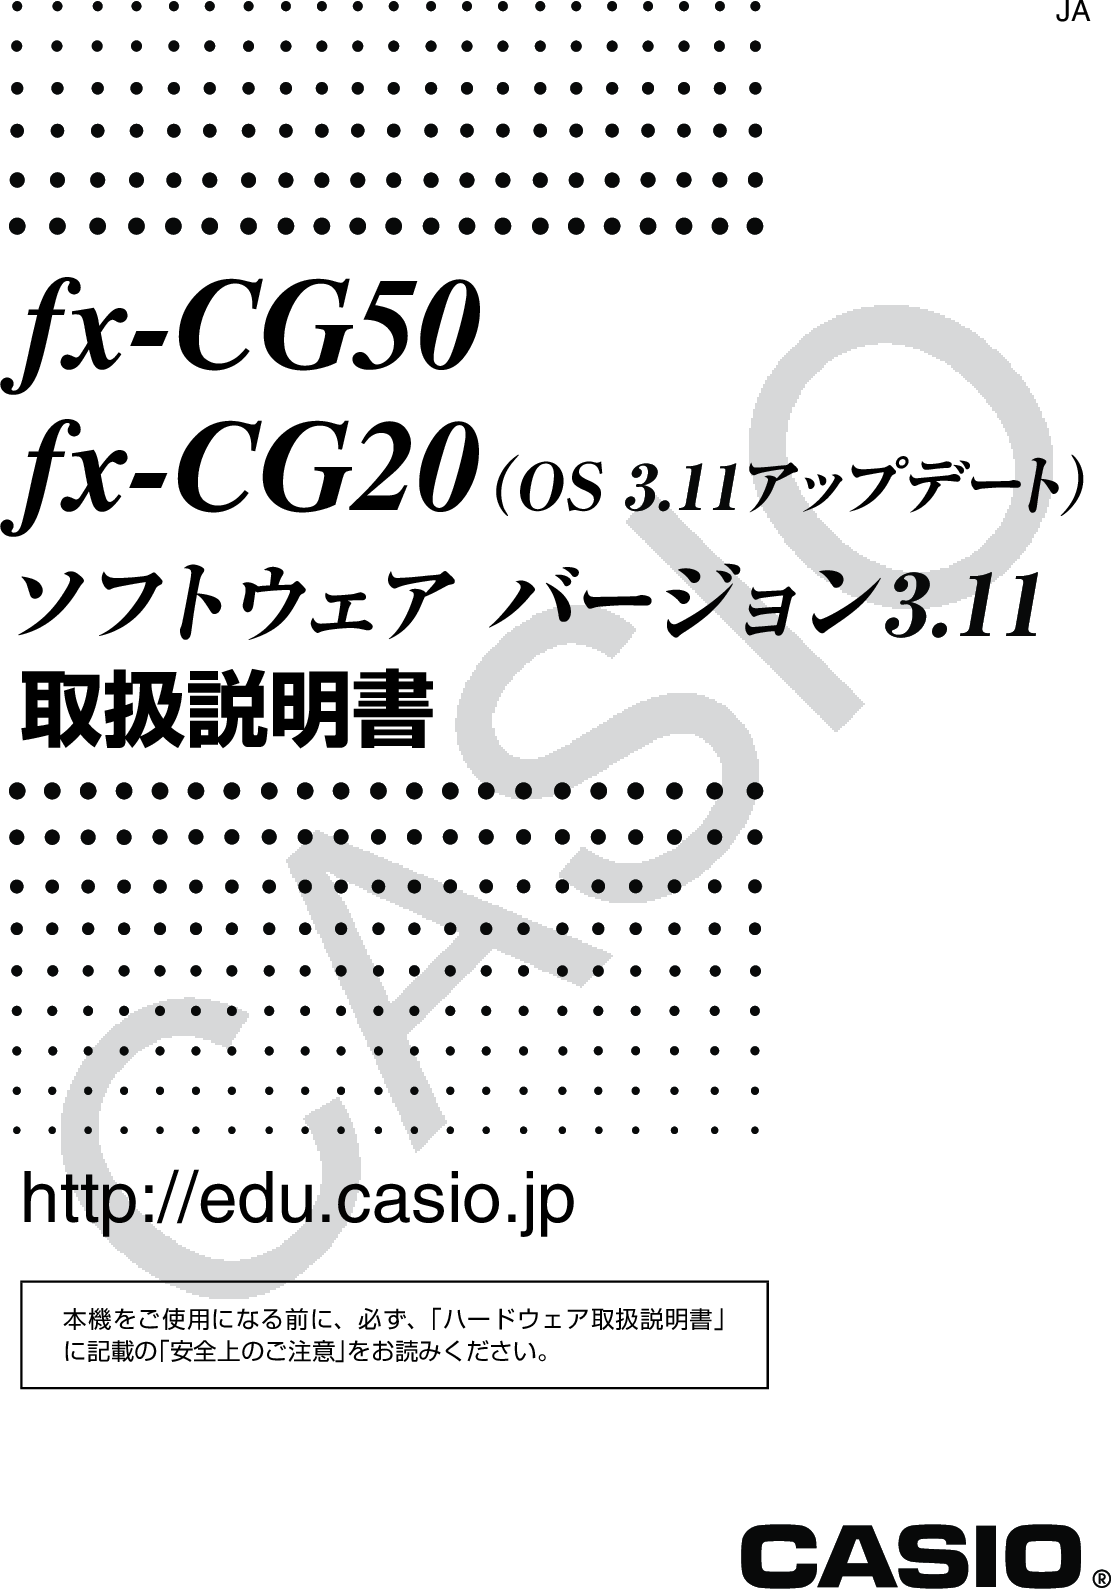 Casio Fx CG50_fx CG20 CG50 (ソフトウェア バージョン3.11) Soft V311 JA